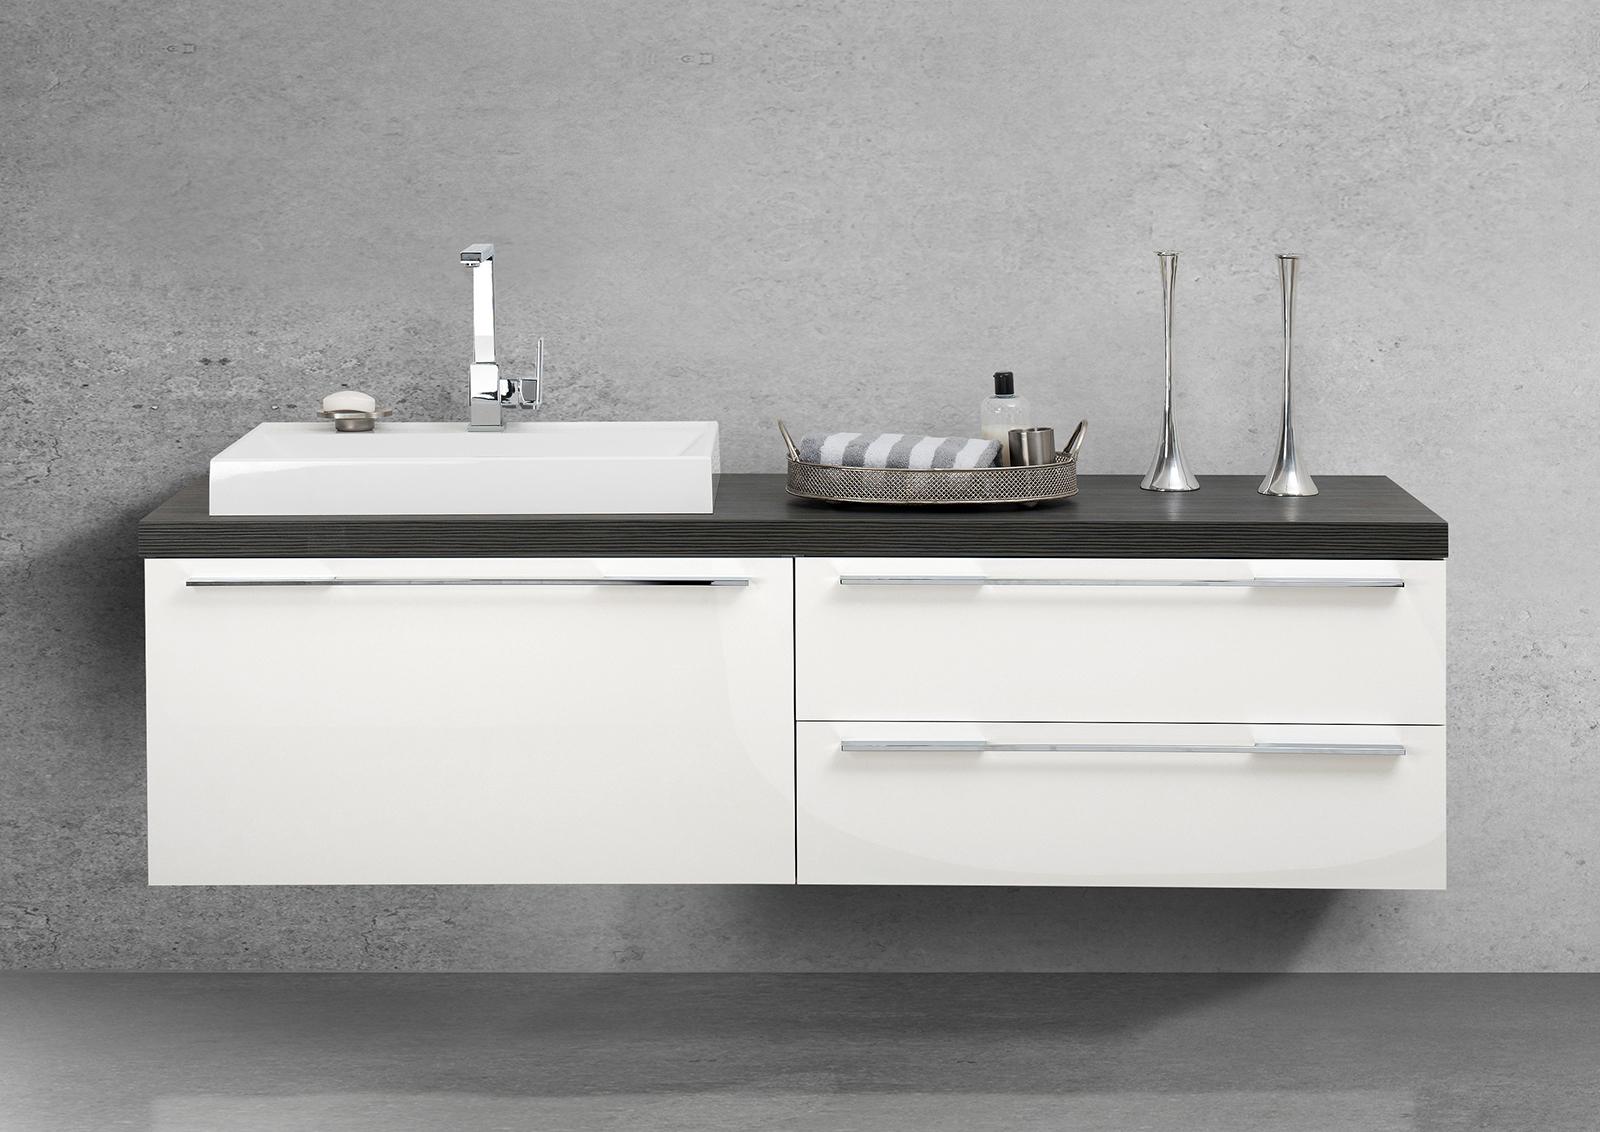 Waschtischplatte badm bel set luxor design for Design waschtischunterschrank